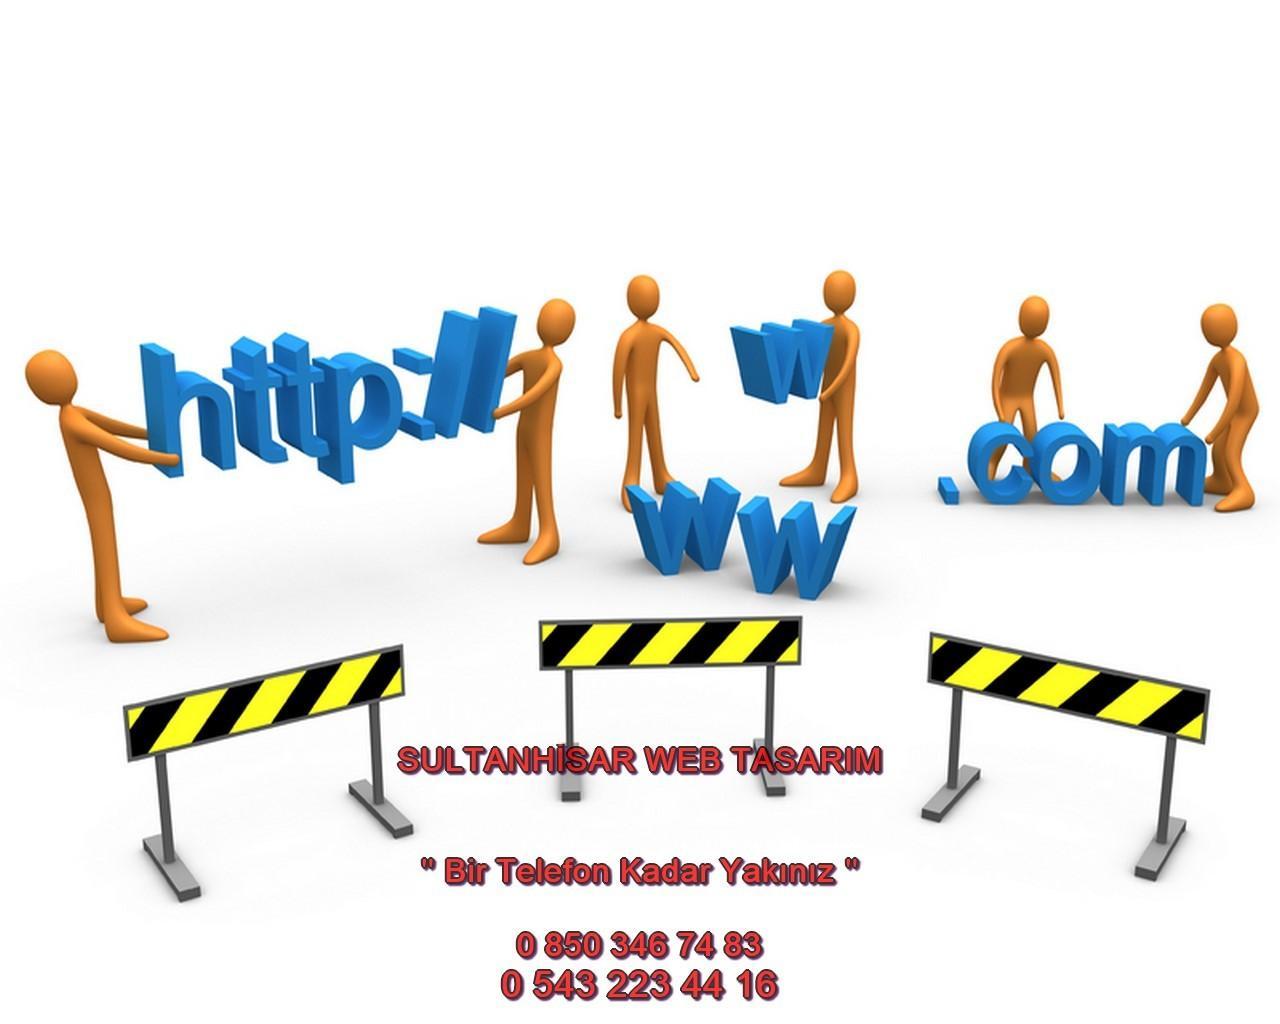 Sultanhisar Web Tasarım